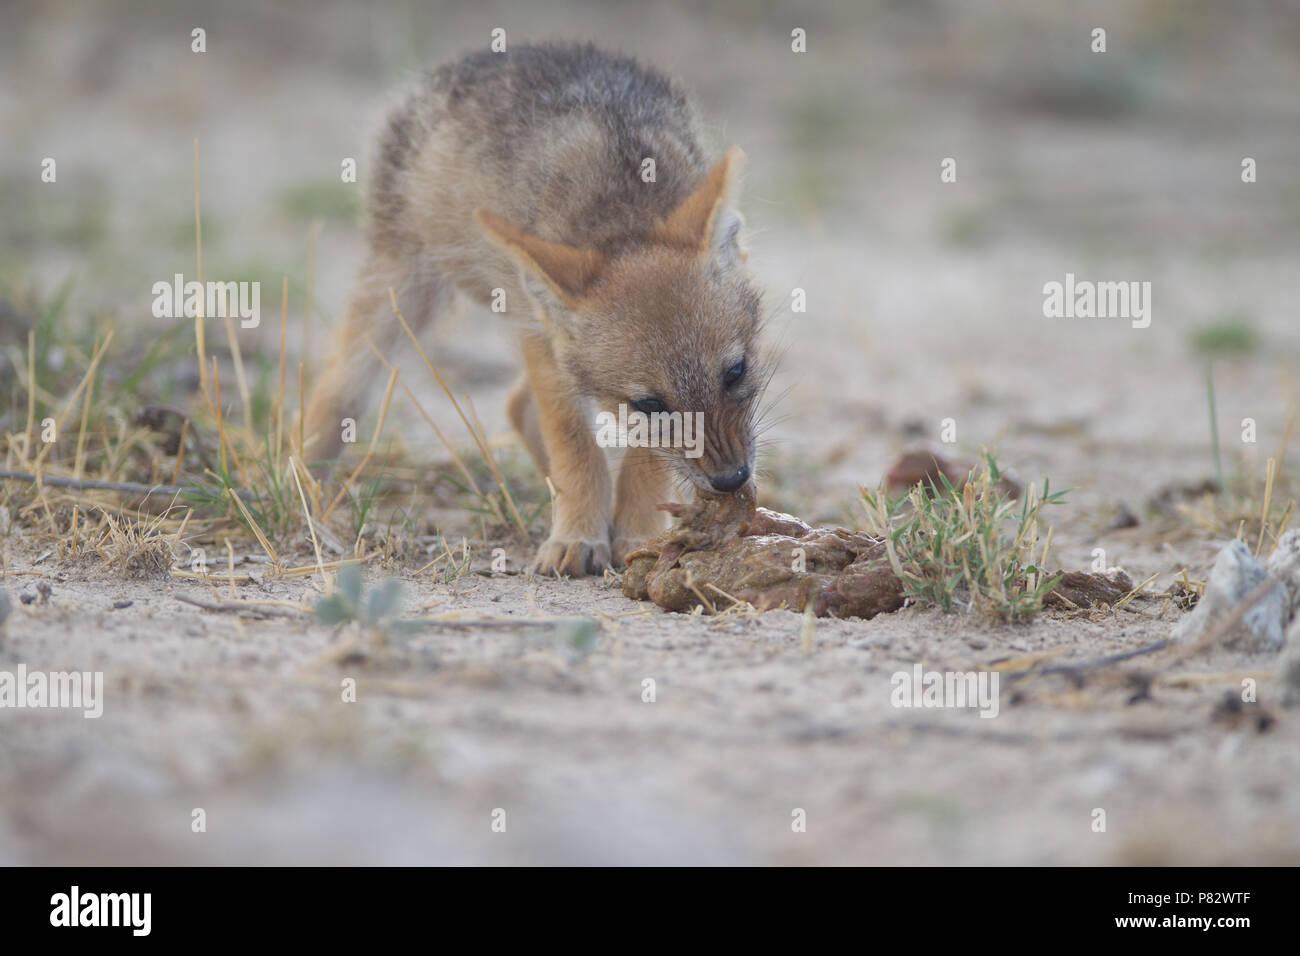 Black backed jackal whelp pup feeding with regurgitated food regurgitation - Stock Image